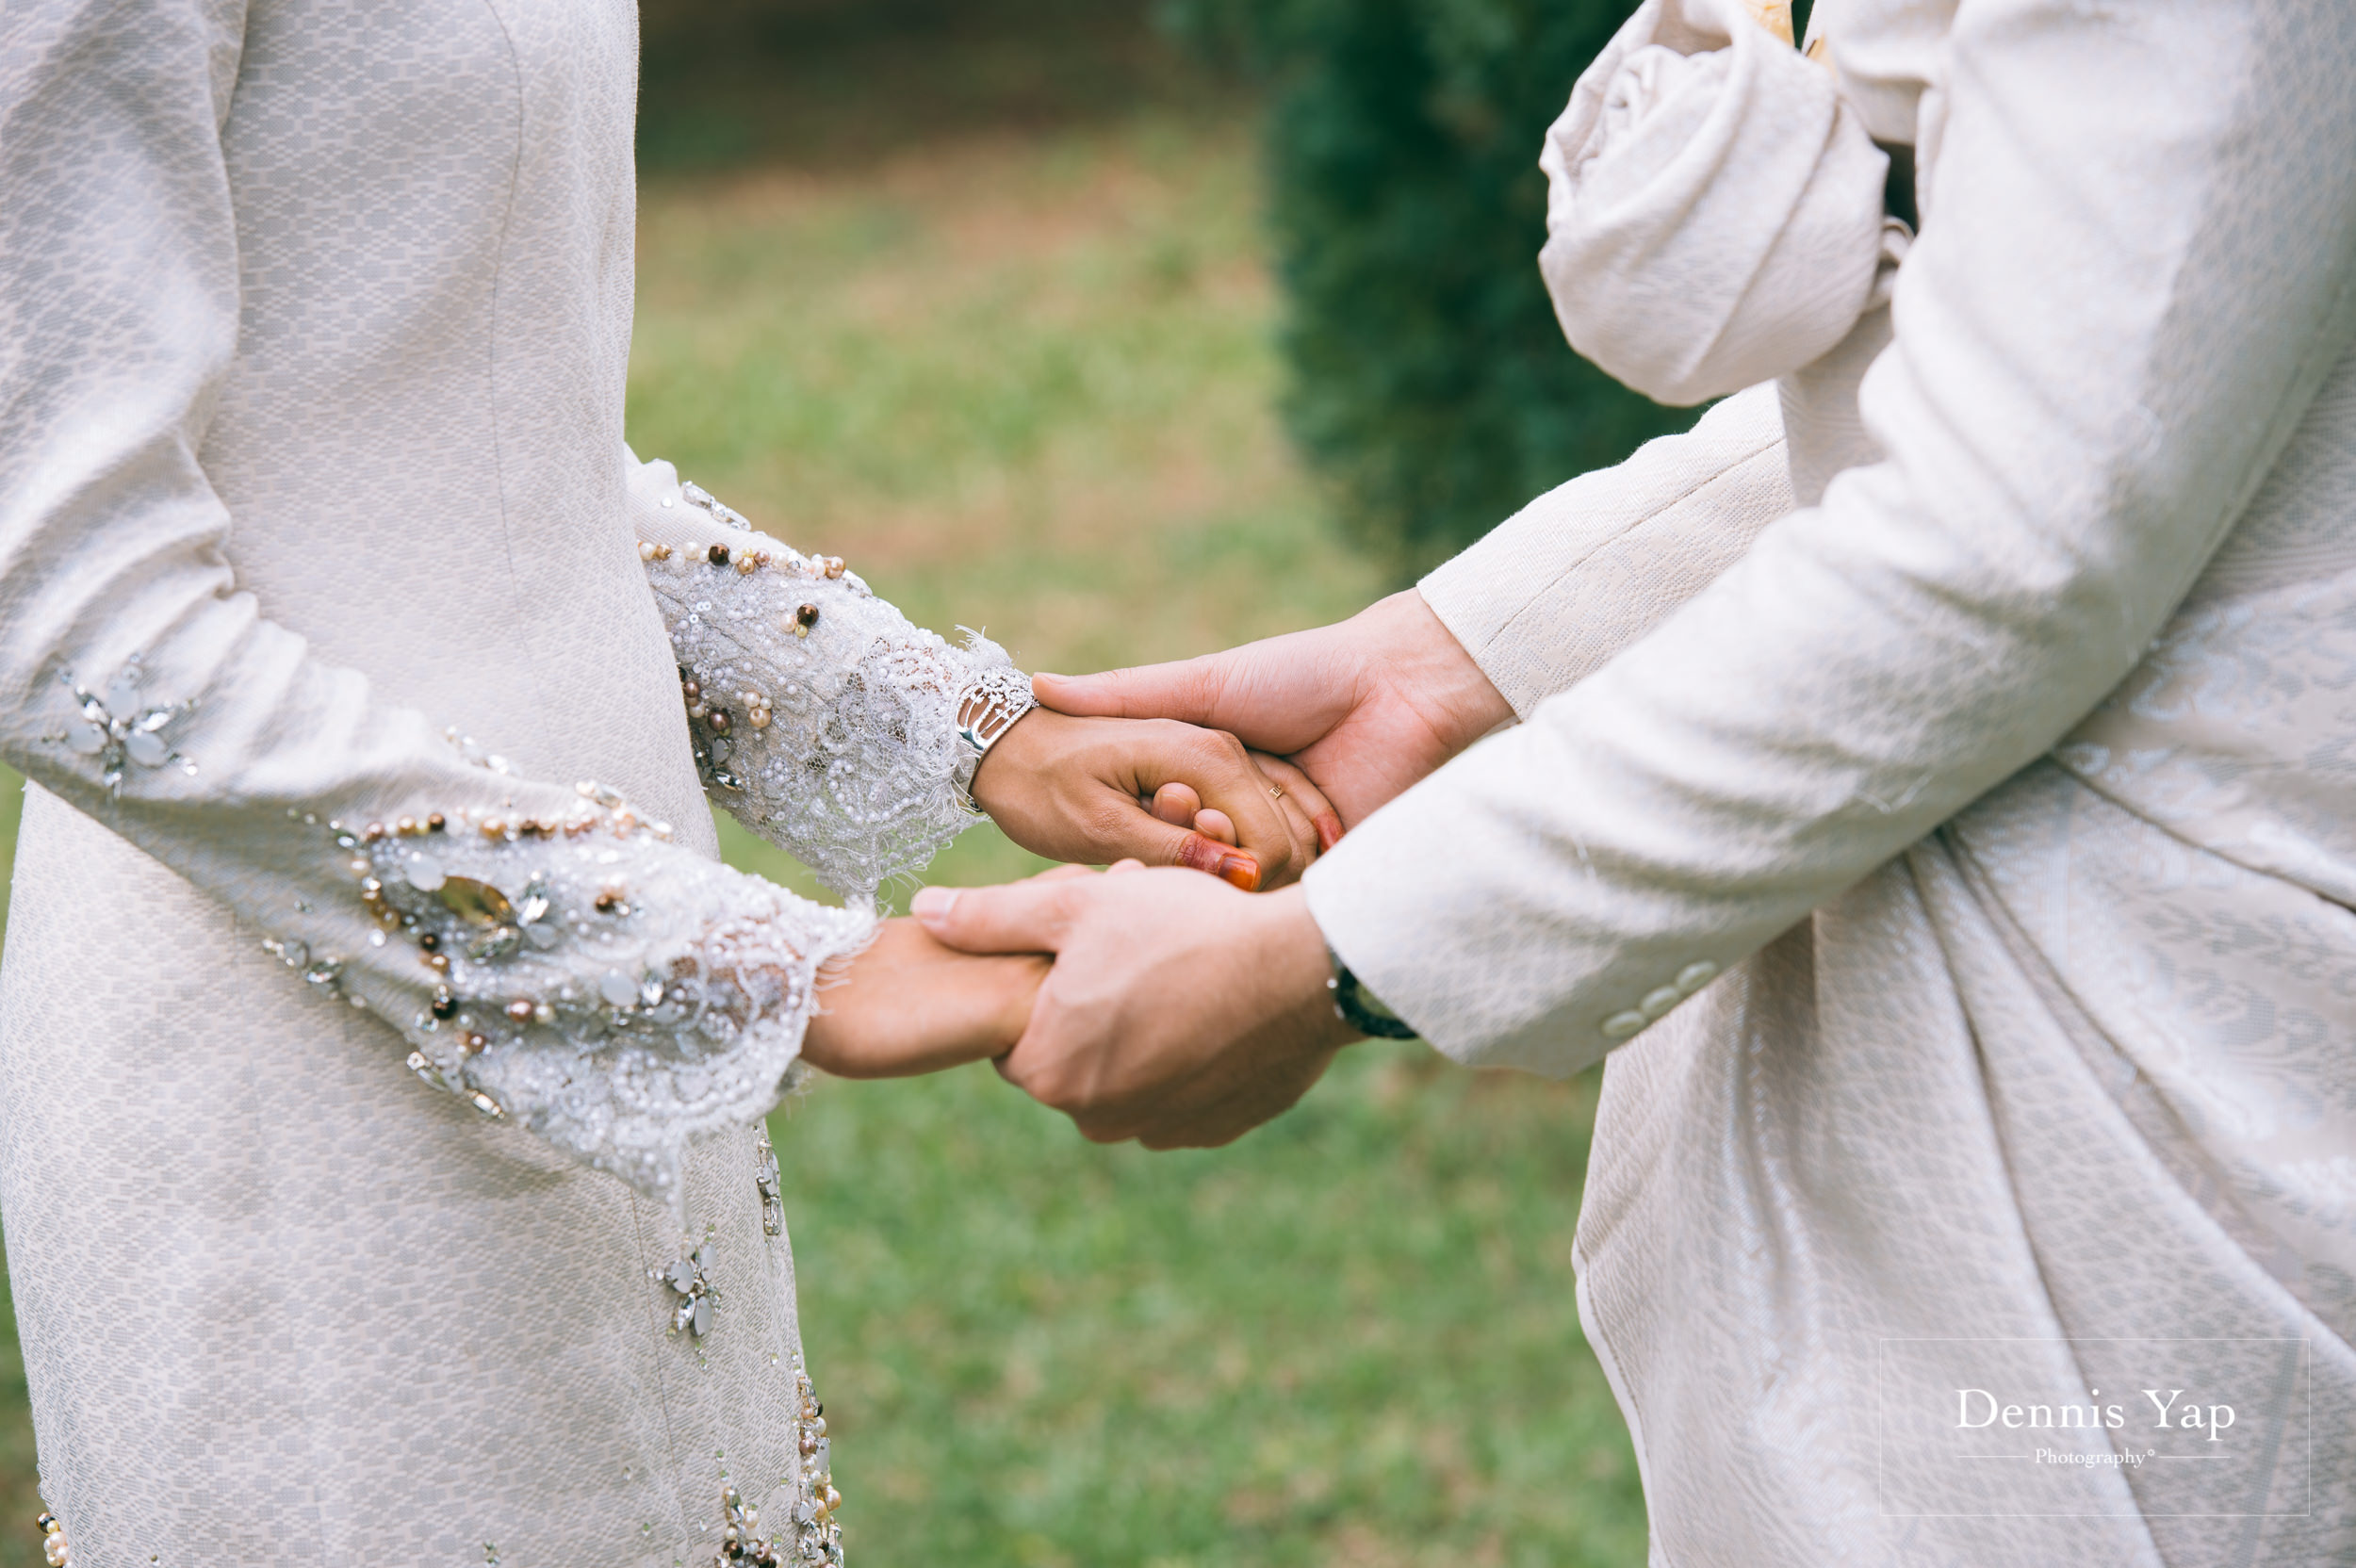 zarif hanalili malay wedding blessing ceremony dennis yap photography-28.jpg